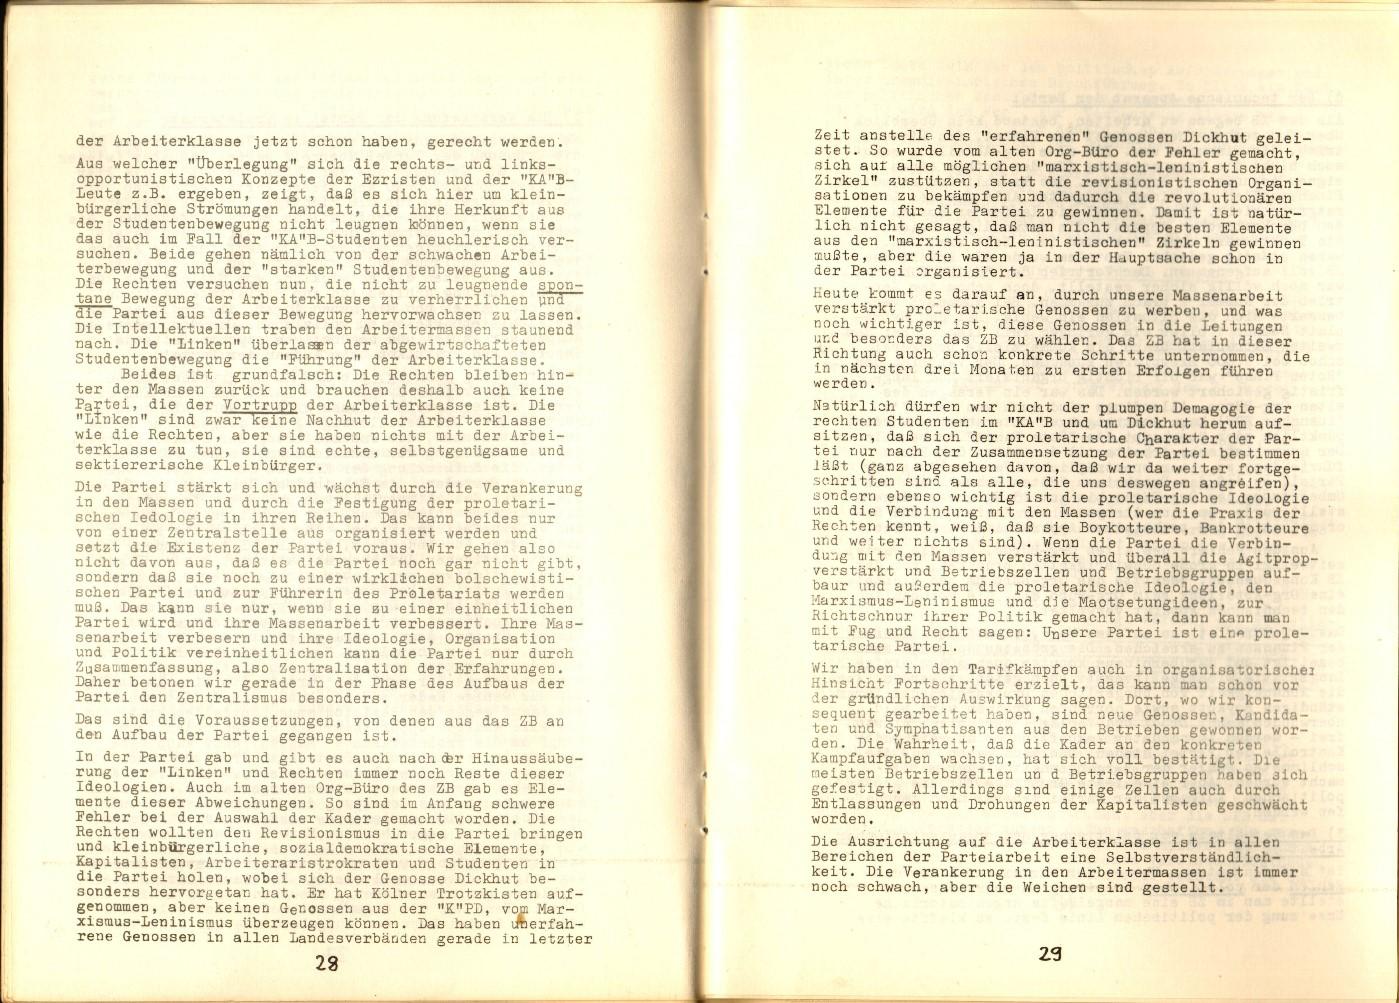 ZB_Parteiarbeiter_1970_03_19